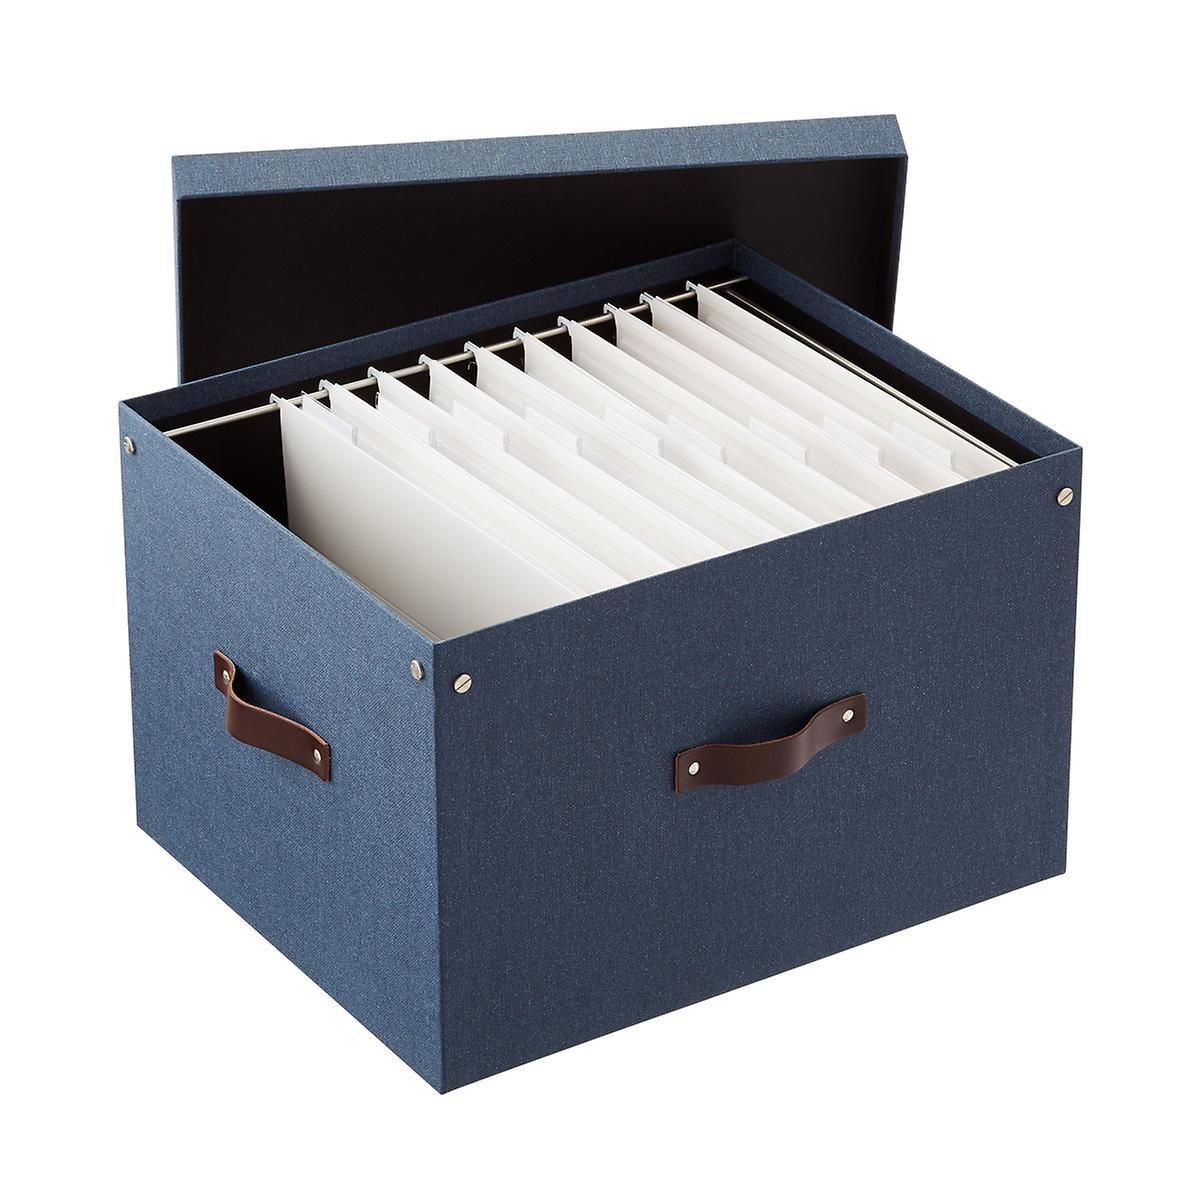 Navy Marten Letter/Legal File Storage Box